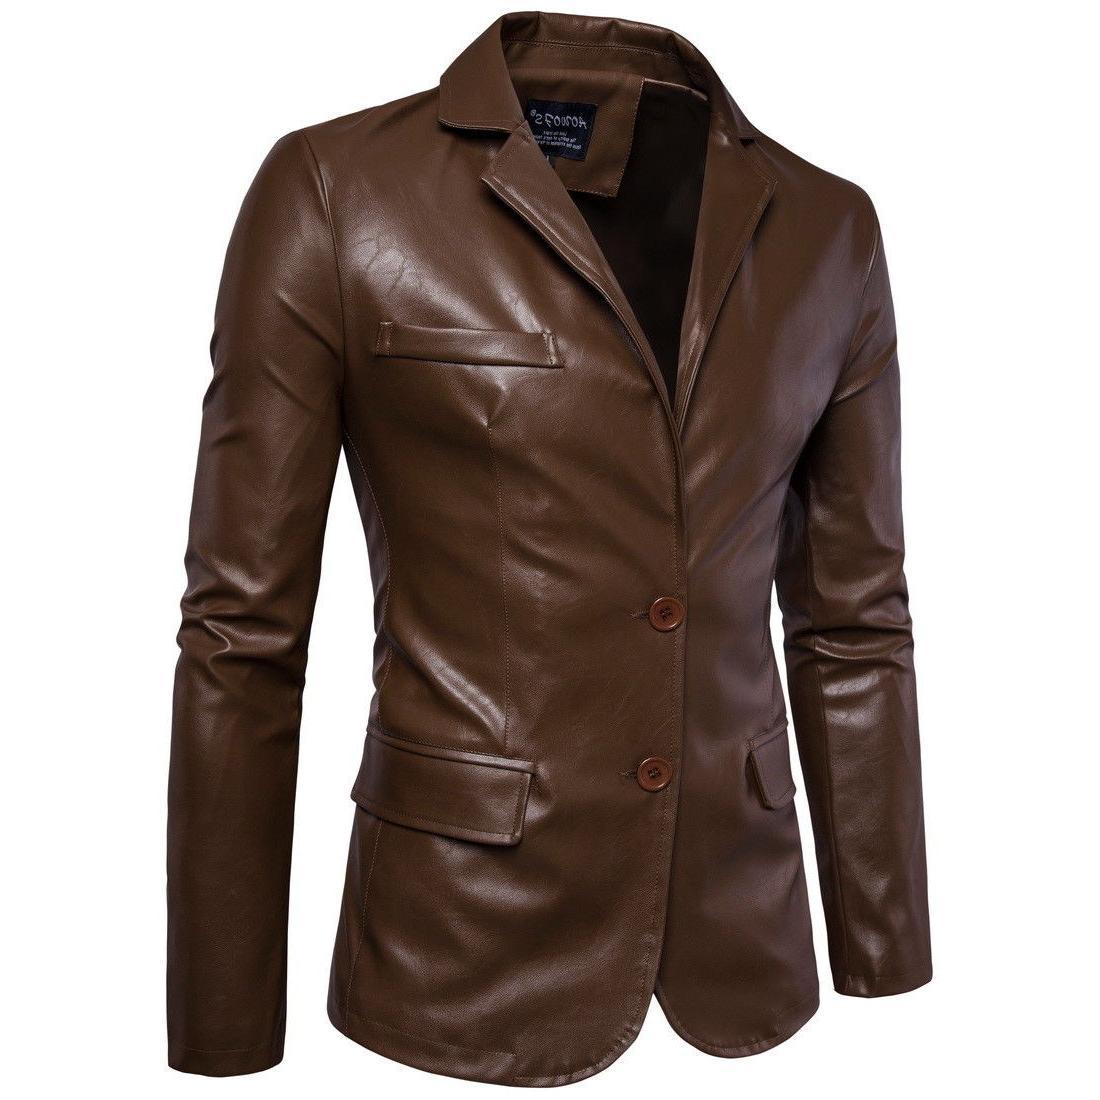 Hot Fall Leather Leather Back Coat